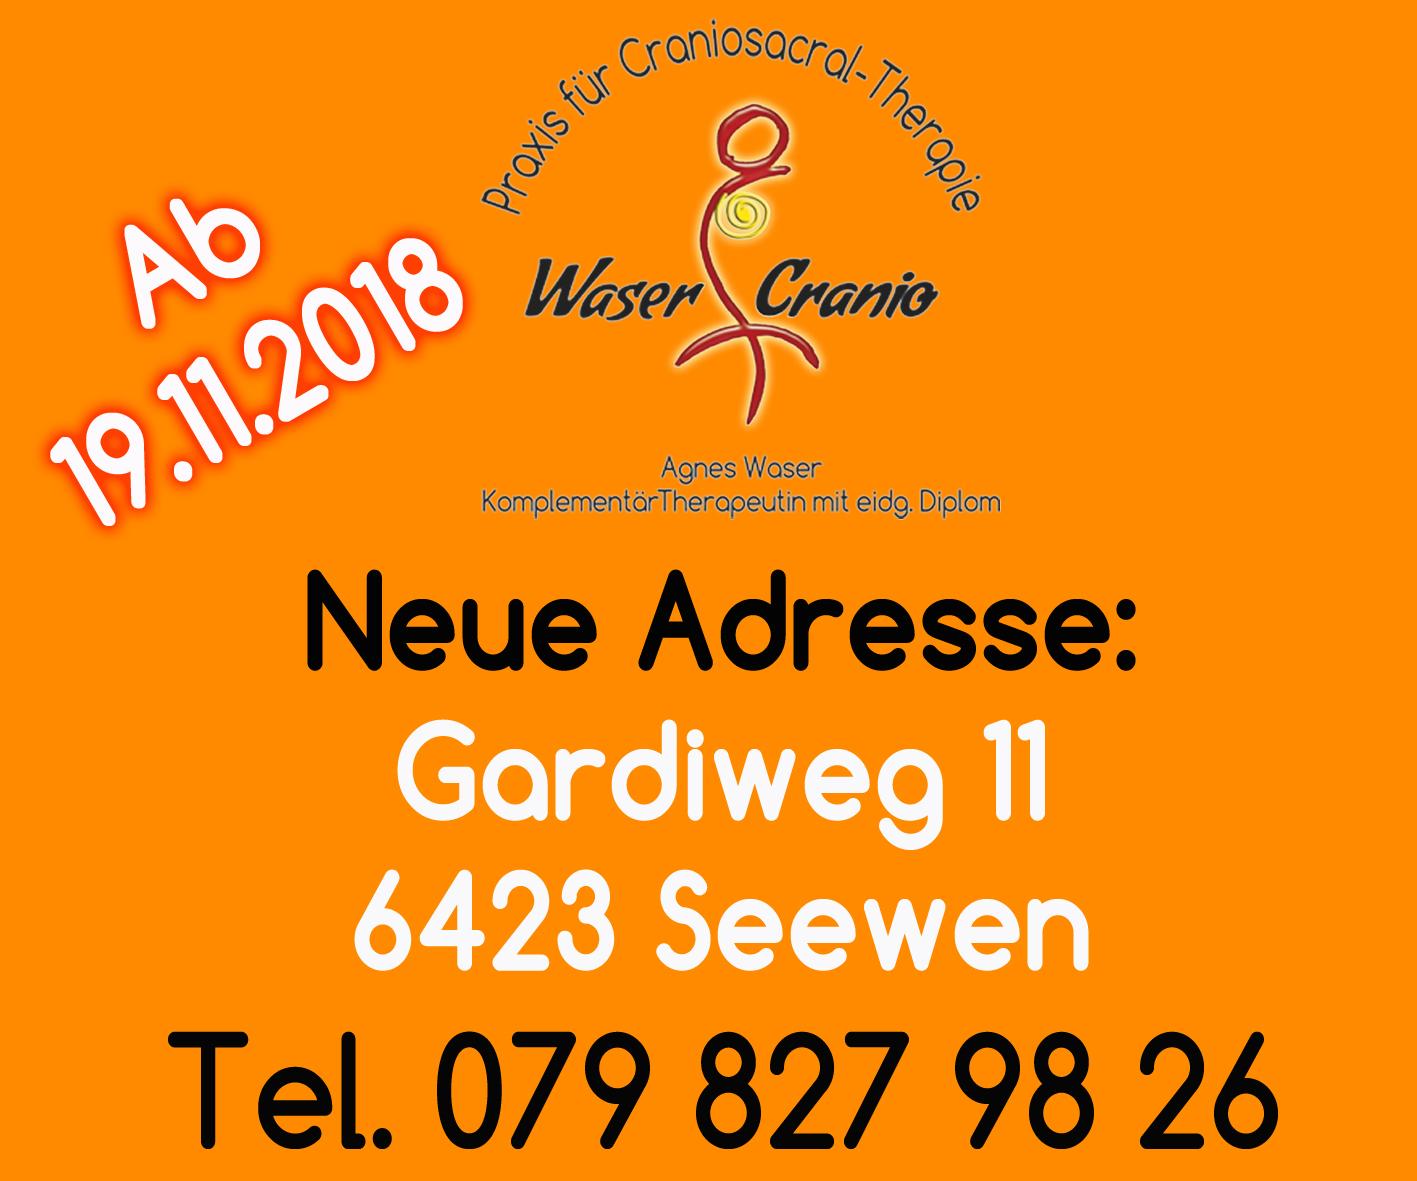 Neue Adresse ab 19.11.2018 Gardiweg 11, 6423 Seewen